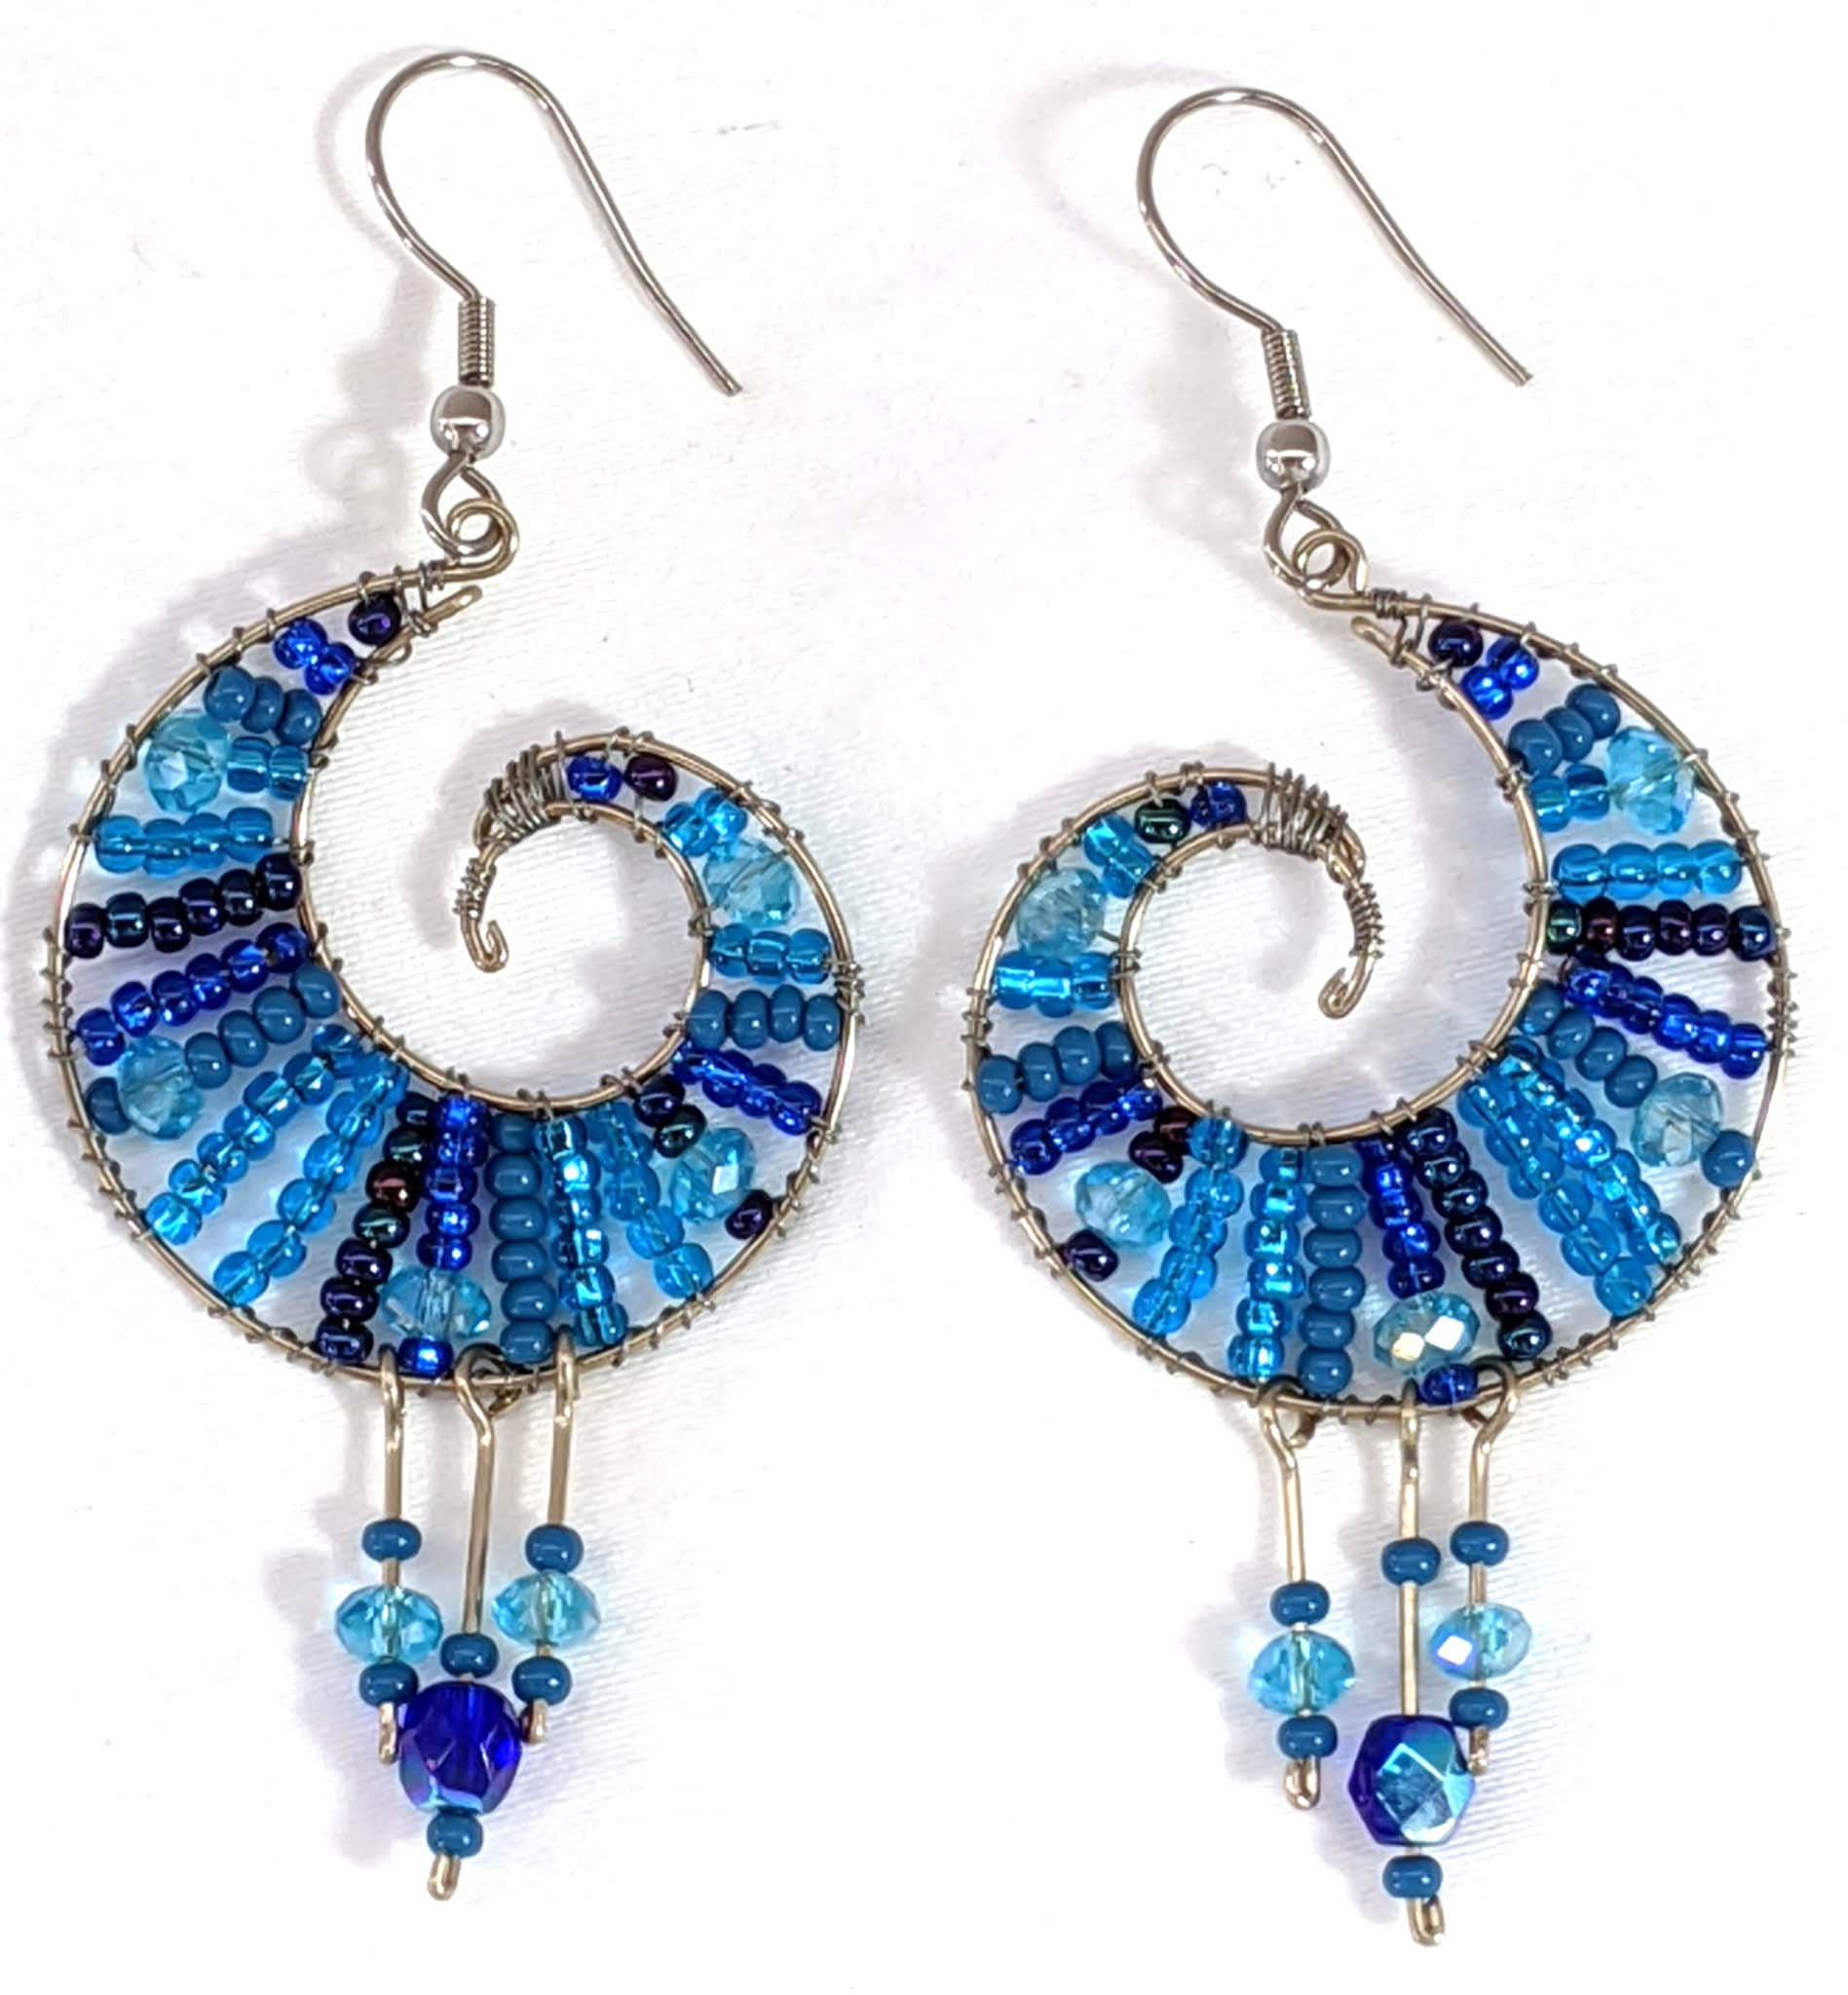 Koru Beaded Earrings - Blues